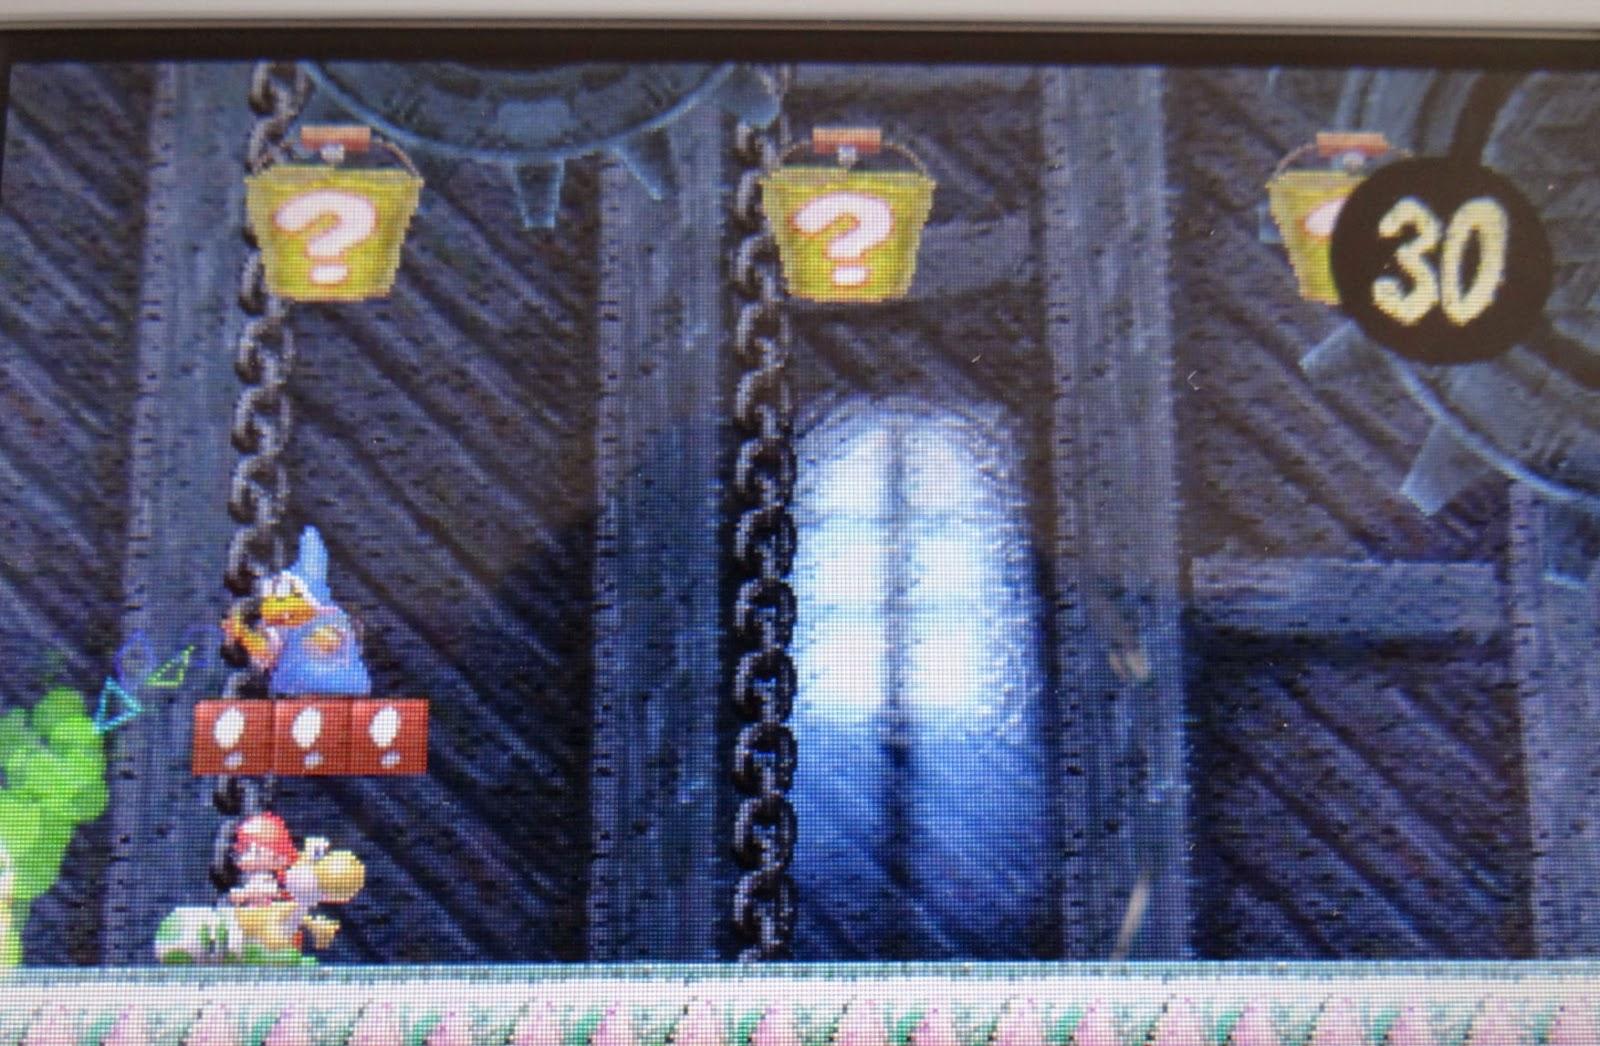 Yoshi's New Island Review, Nintendo 3DS, when Mario met Yoshi